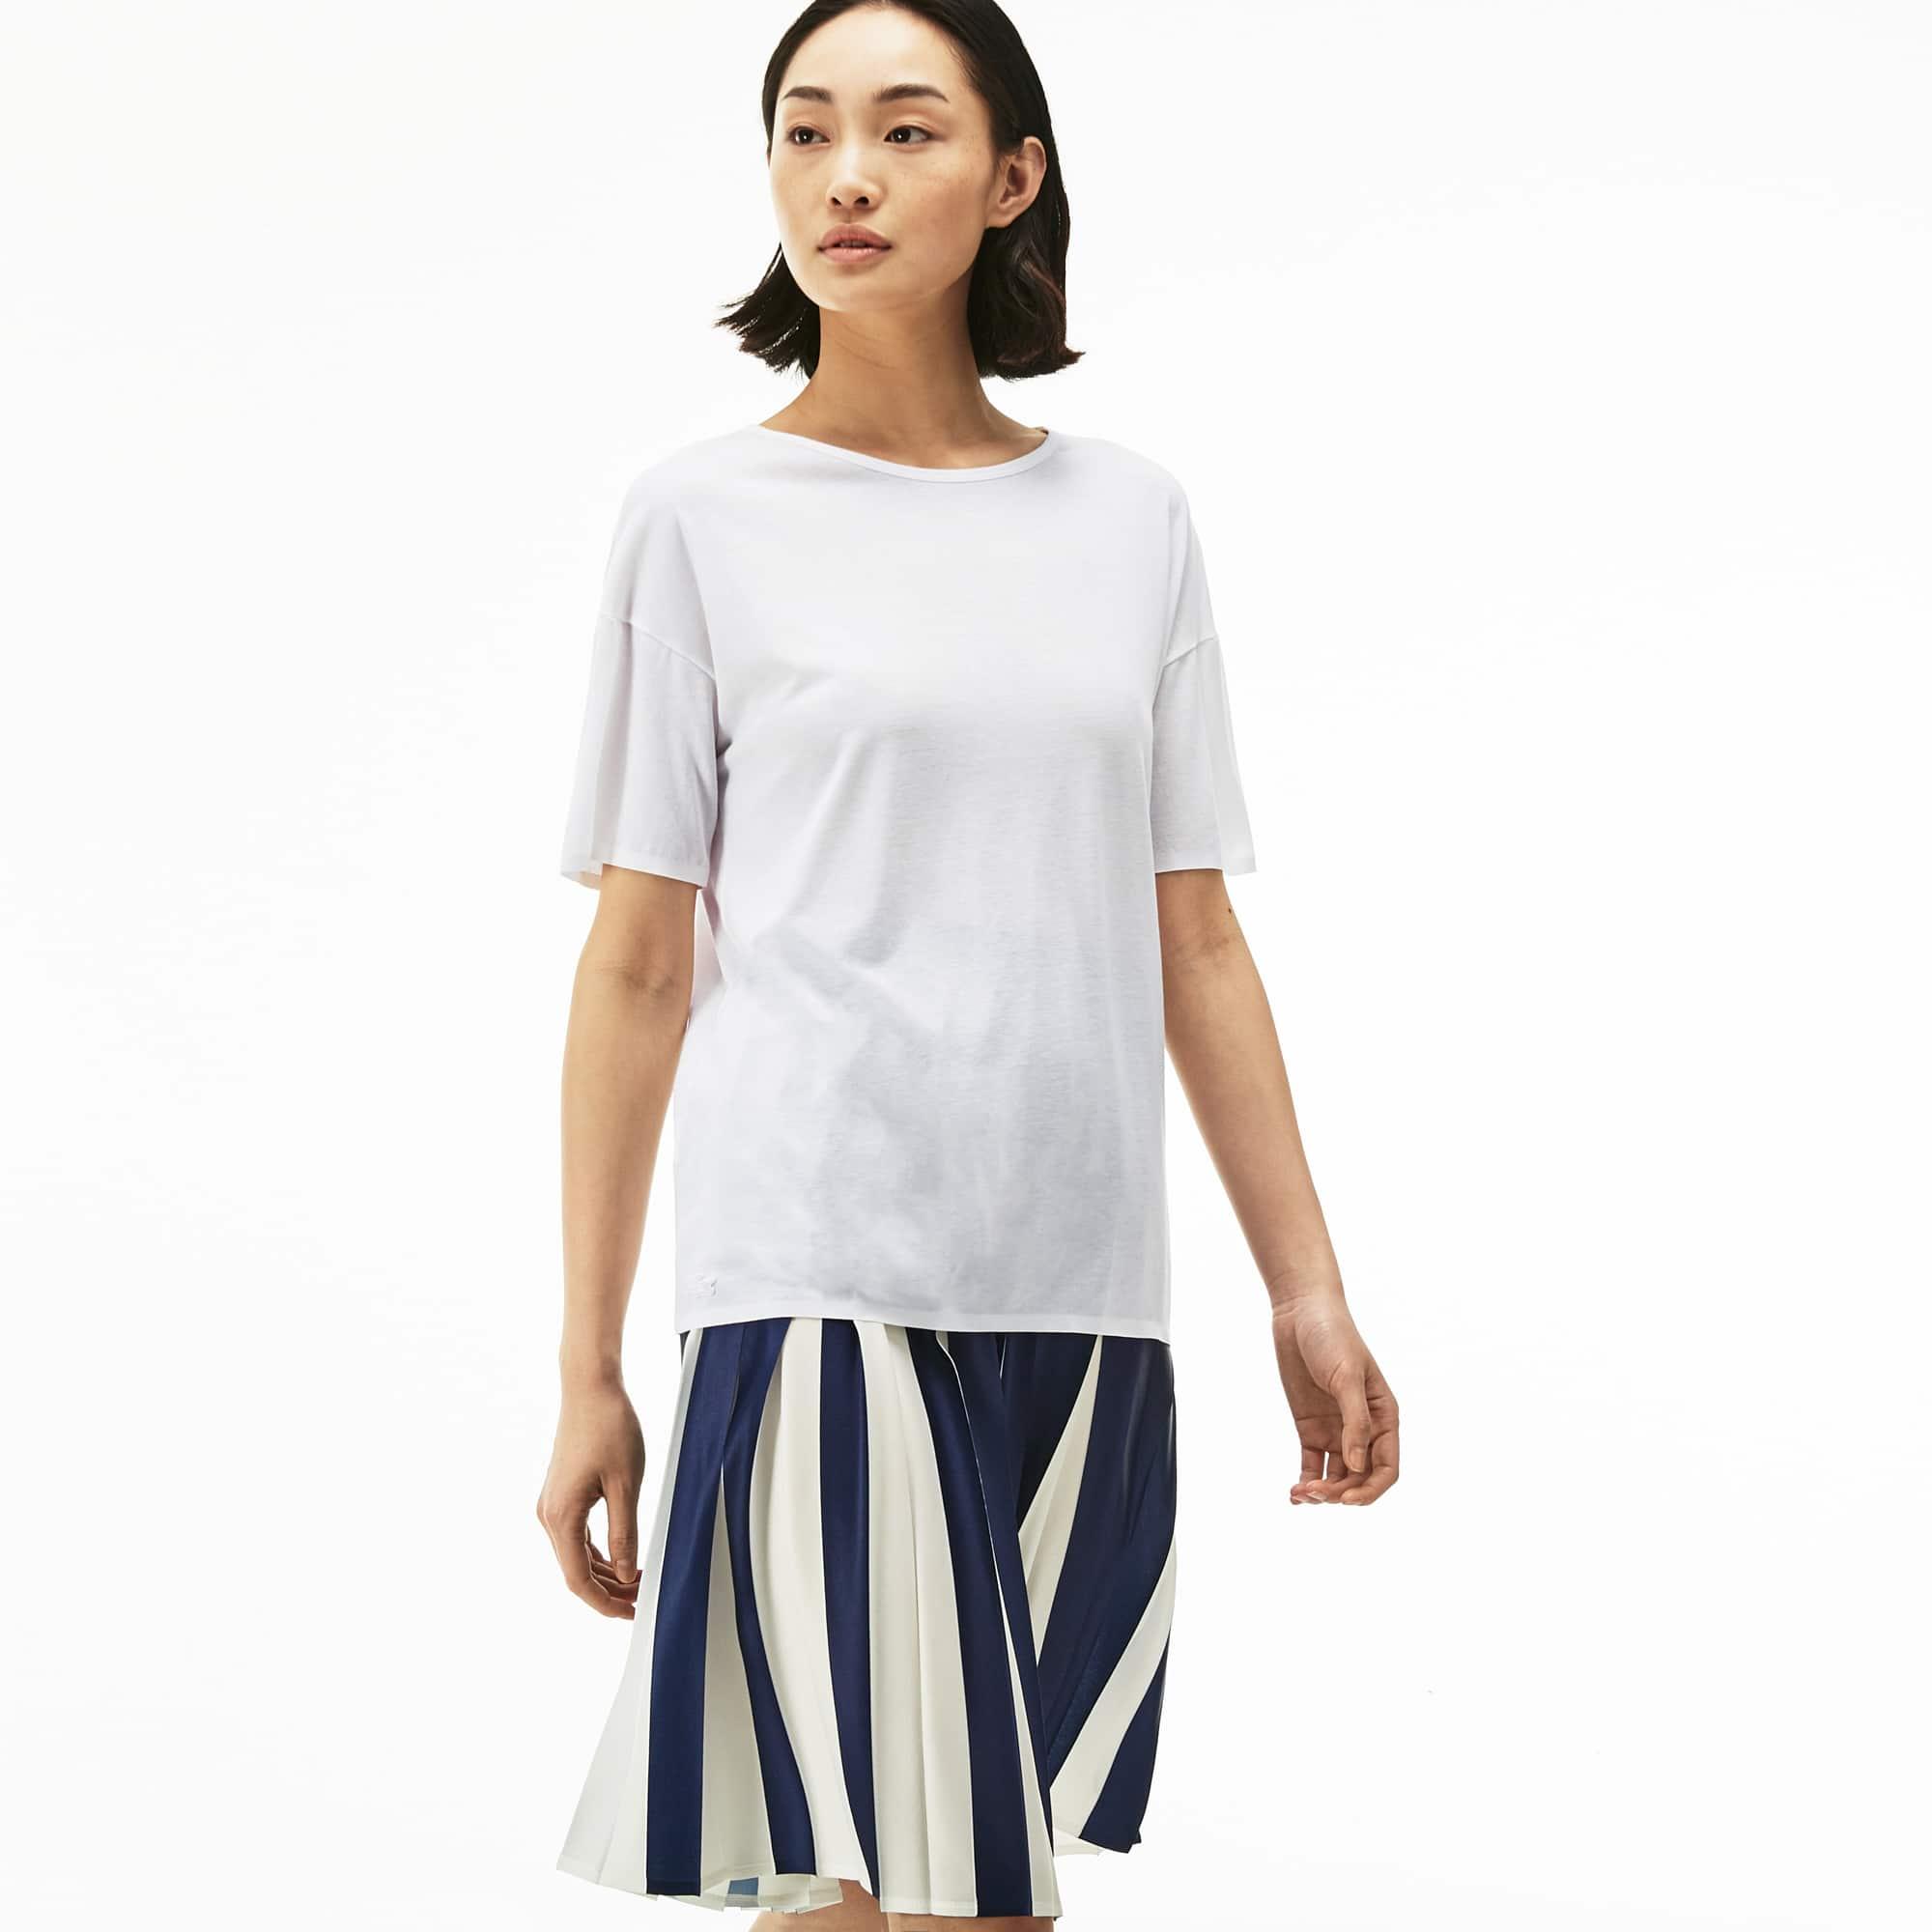 Women's Wide Neck Flowing Jersey T-Shirt